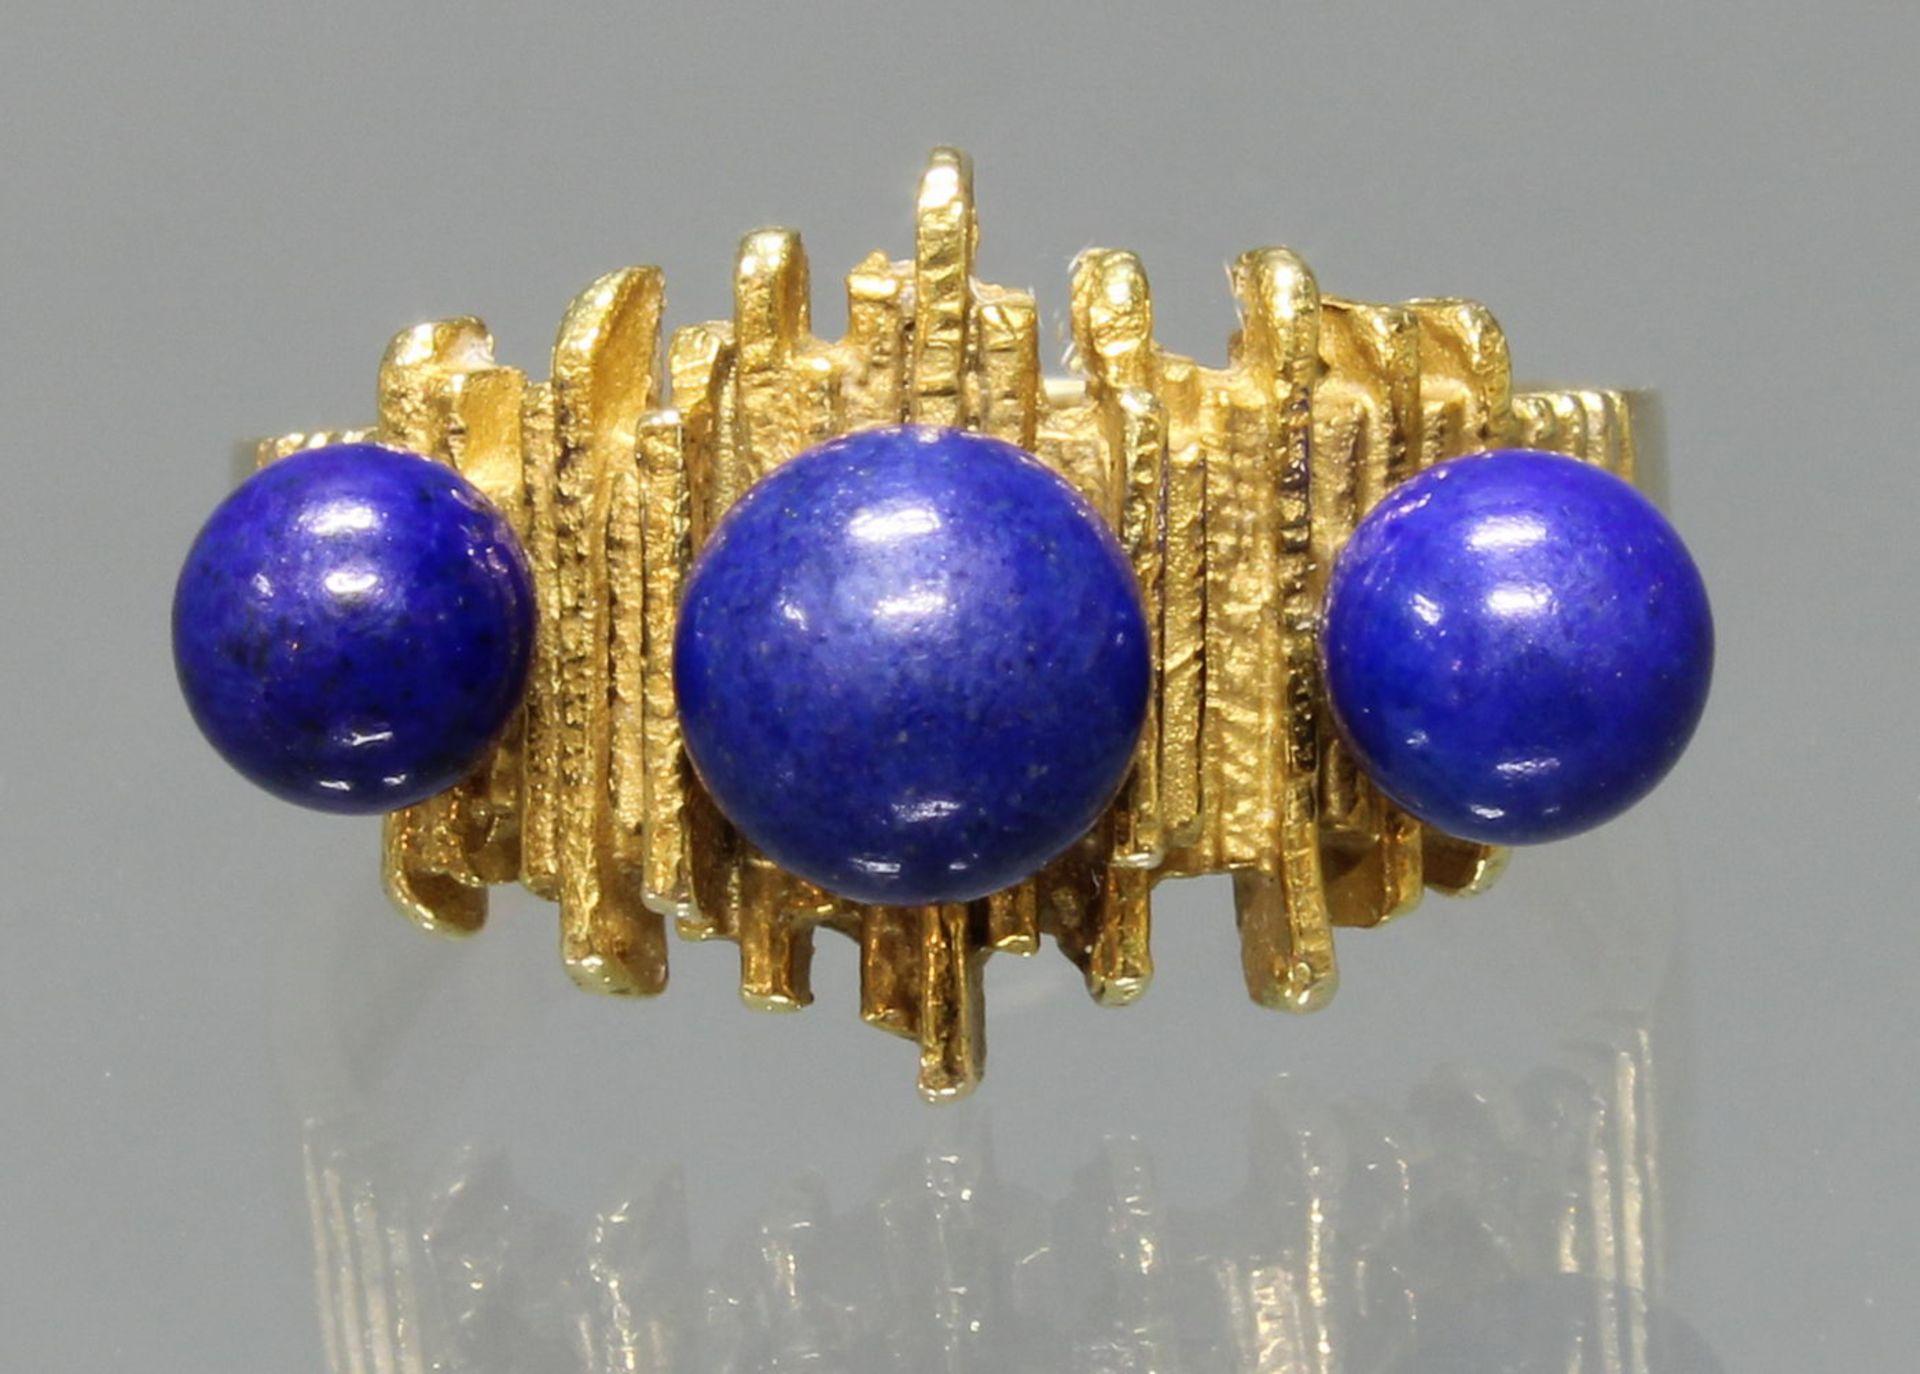 Ring, GG 585, 3 Lapislazuli-Kugeln, 6 g, RM 17.5